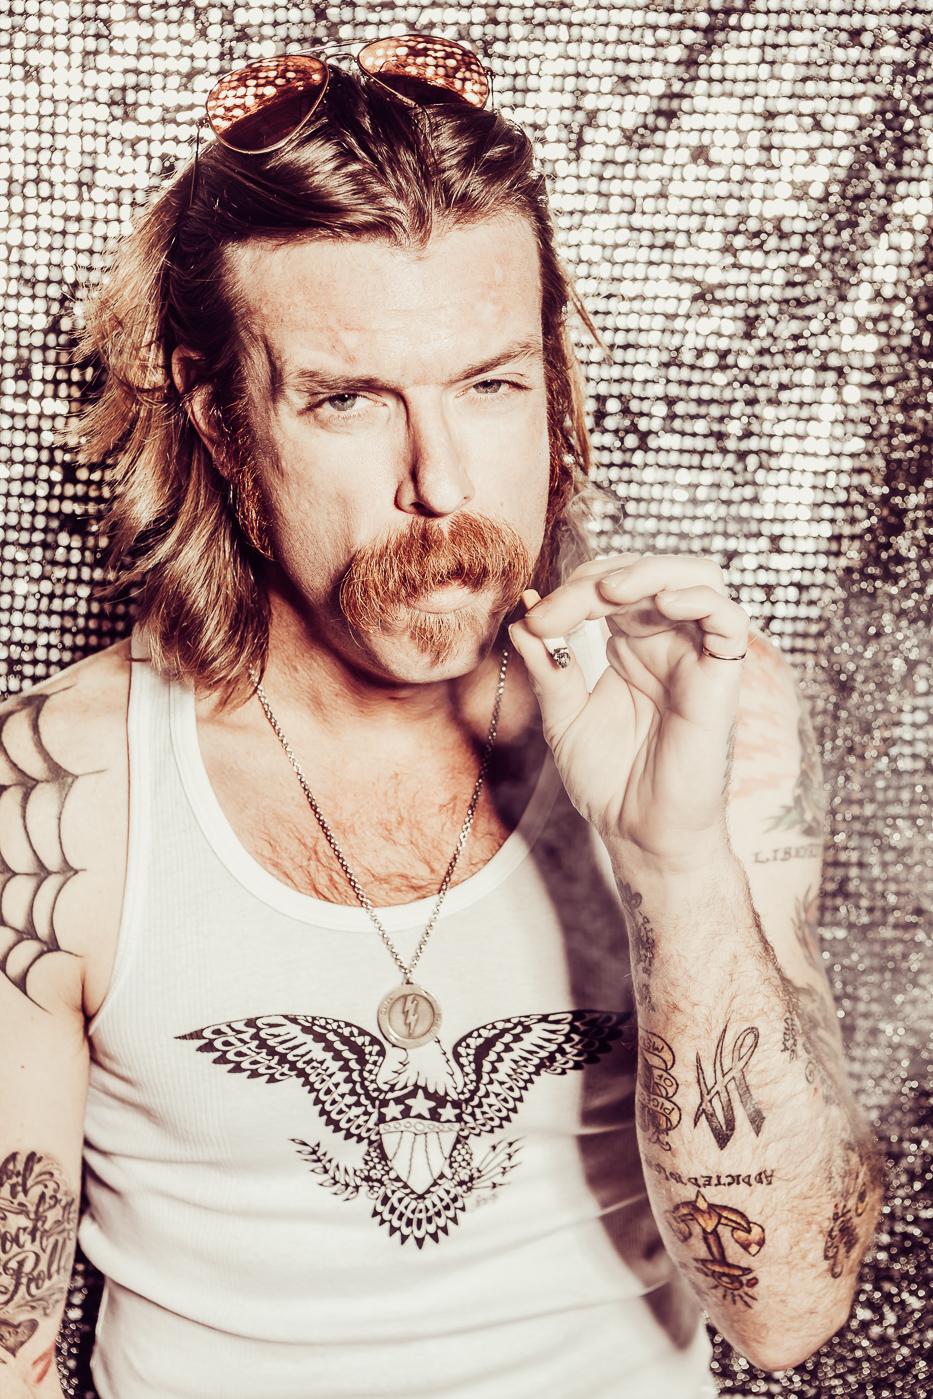 Jesse Hughes, eagles of death metal, Florian Kresse, Photograph, portrait, magazine, Photography, Fotografie, Character,  peoplefotografie, rockstar, Schlachthof Wiesbaden